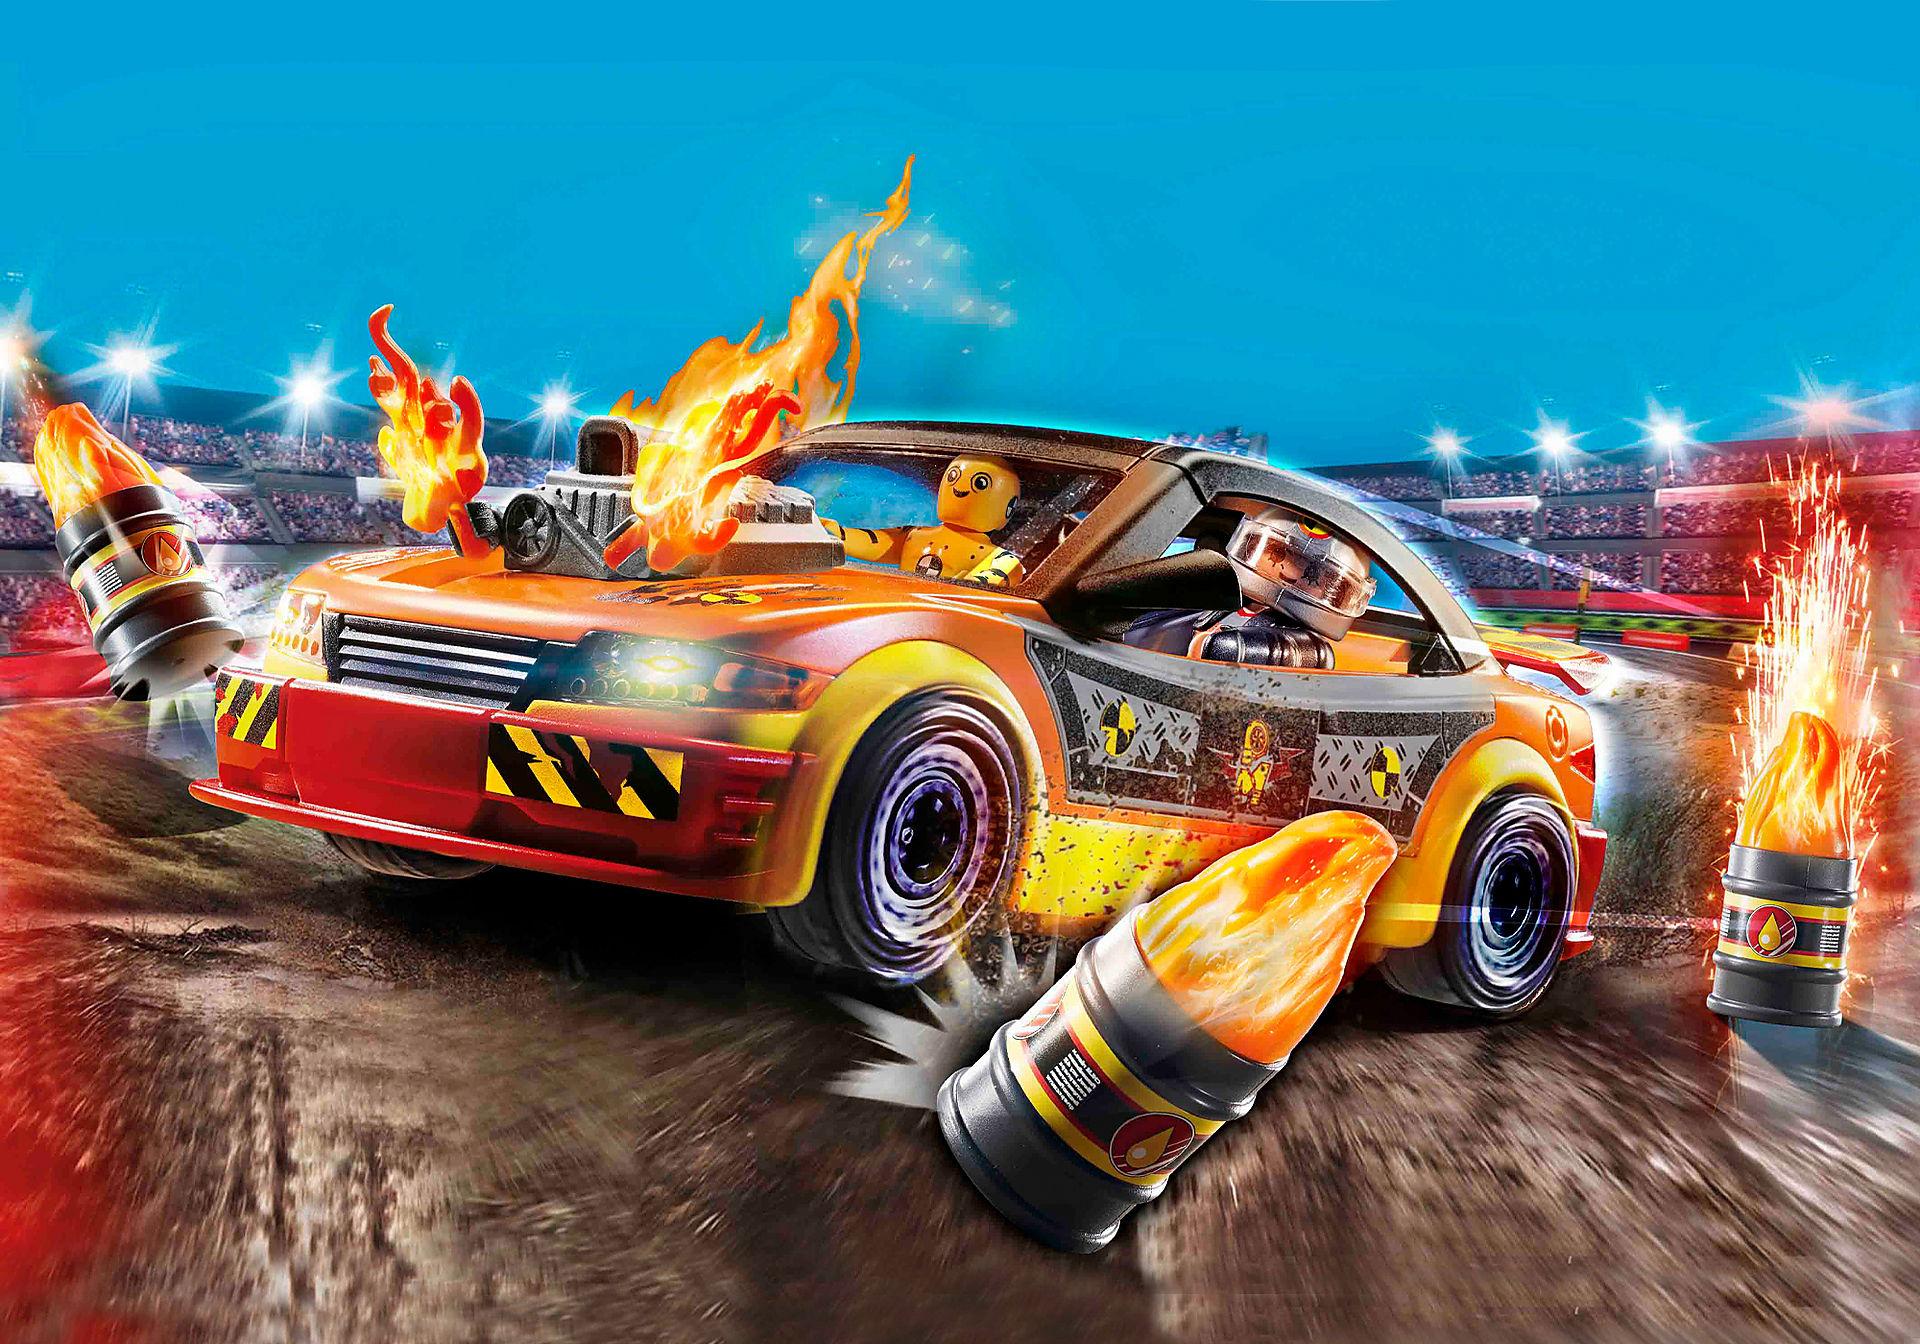 70551 Crash Car zoom image1